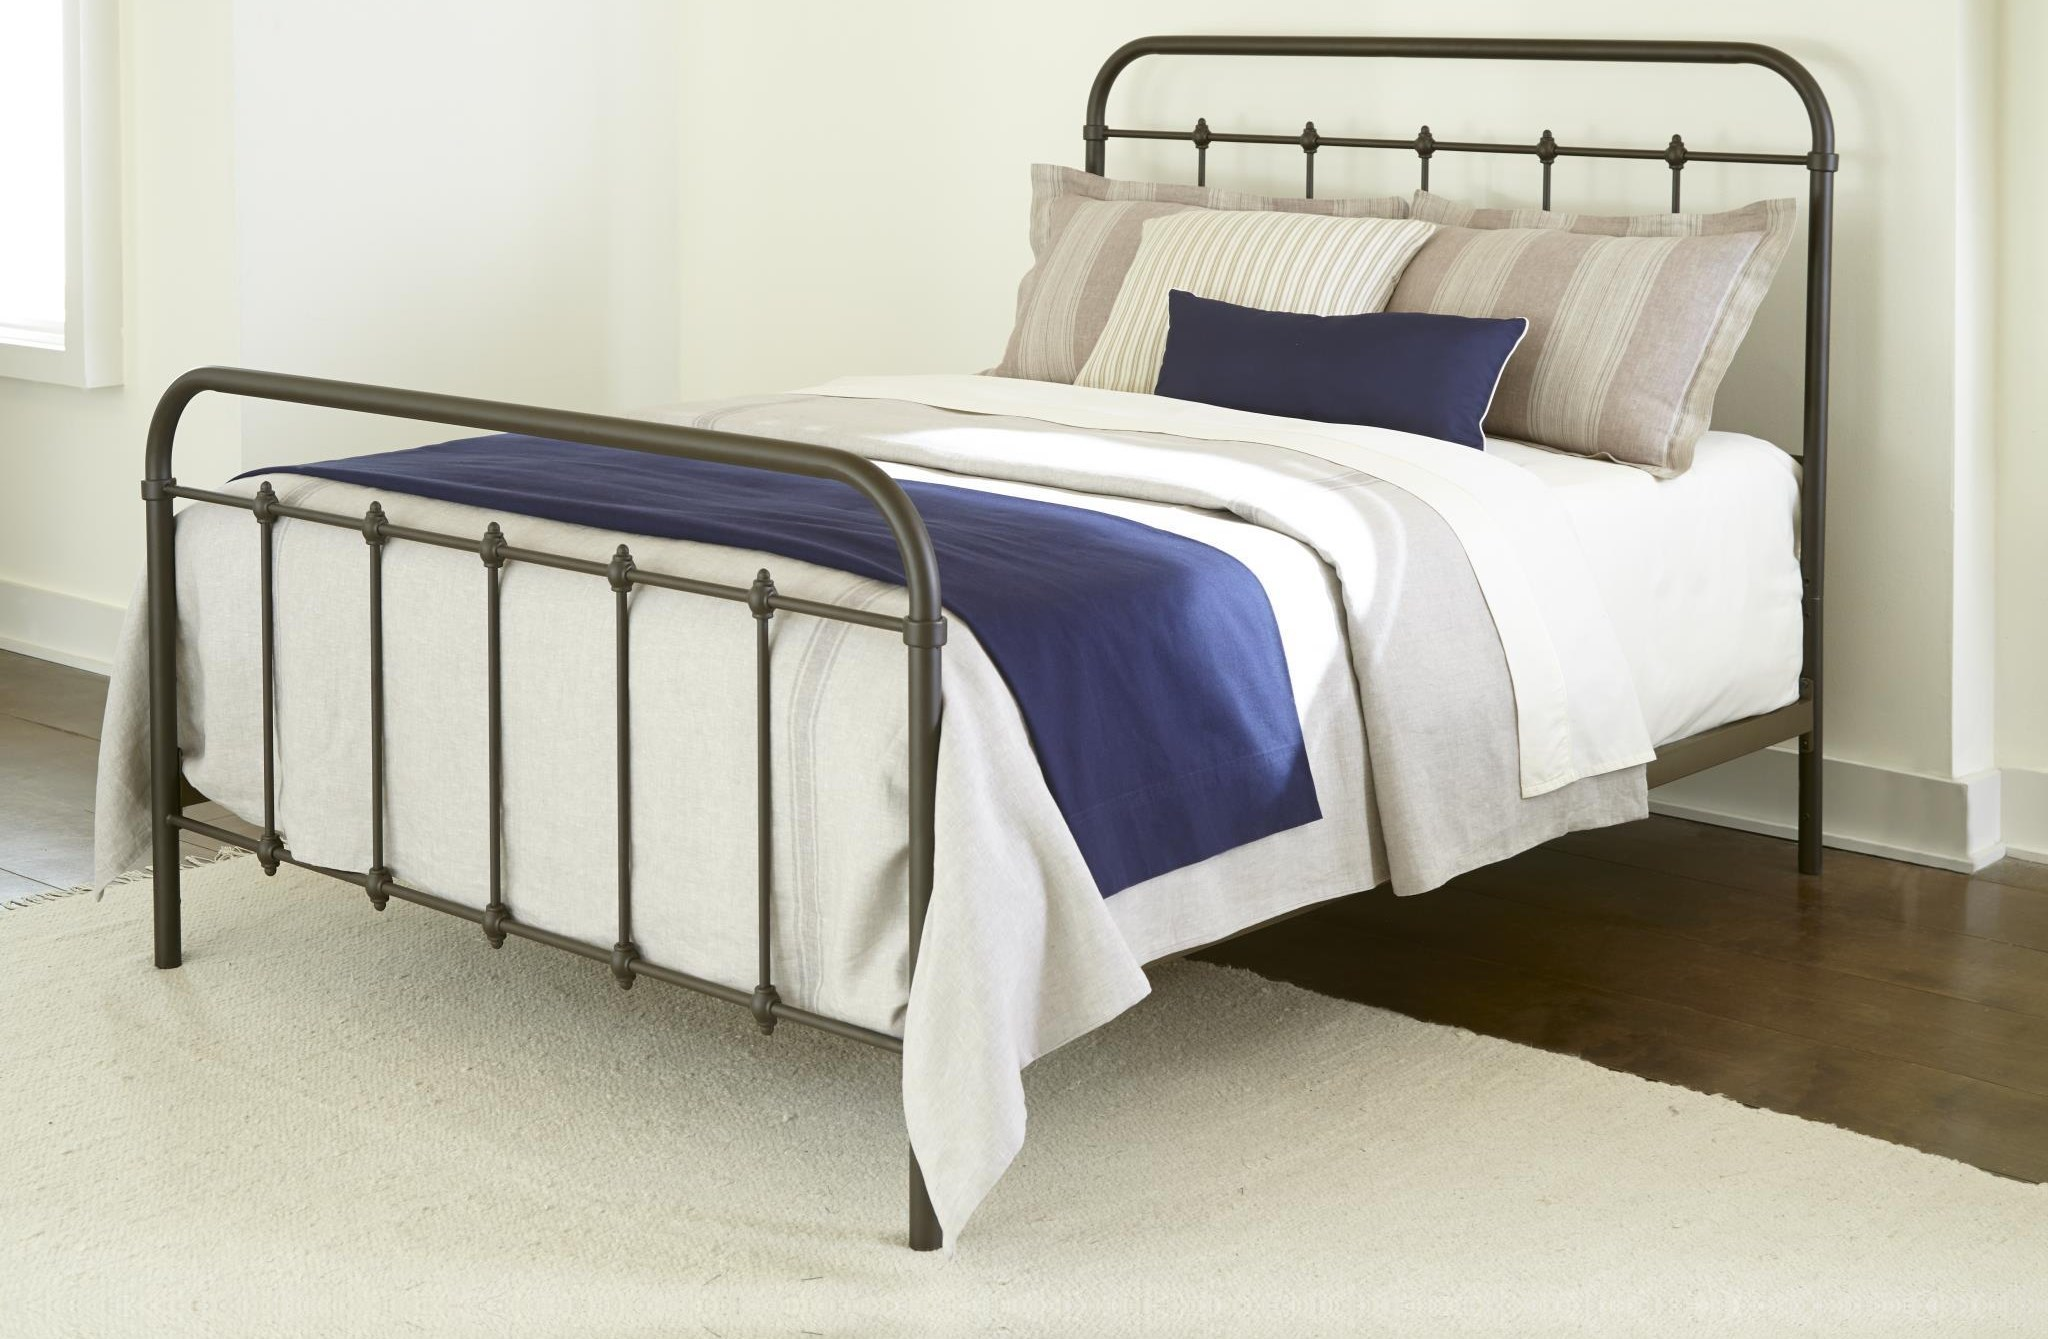 232Grey Twin Size Metal Bed by Kith Furniture at Furniture Fair - North Carolina